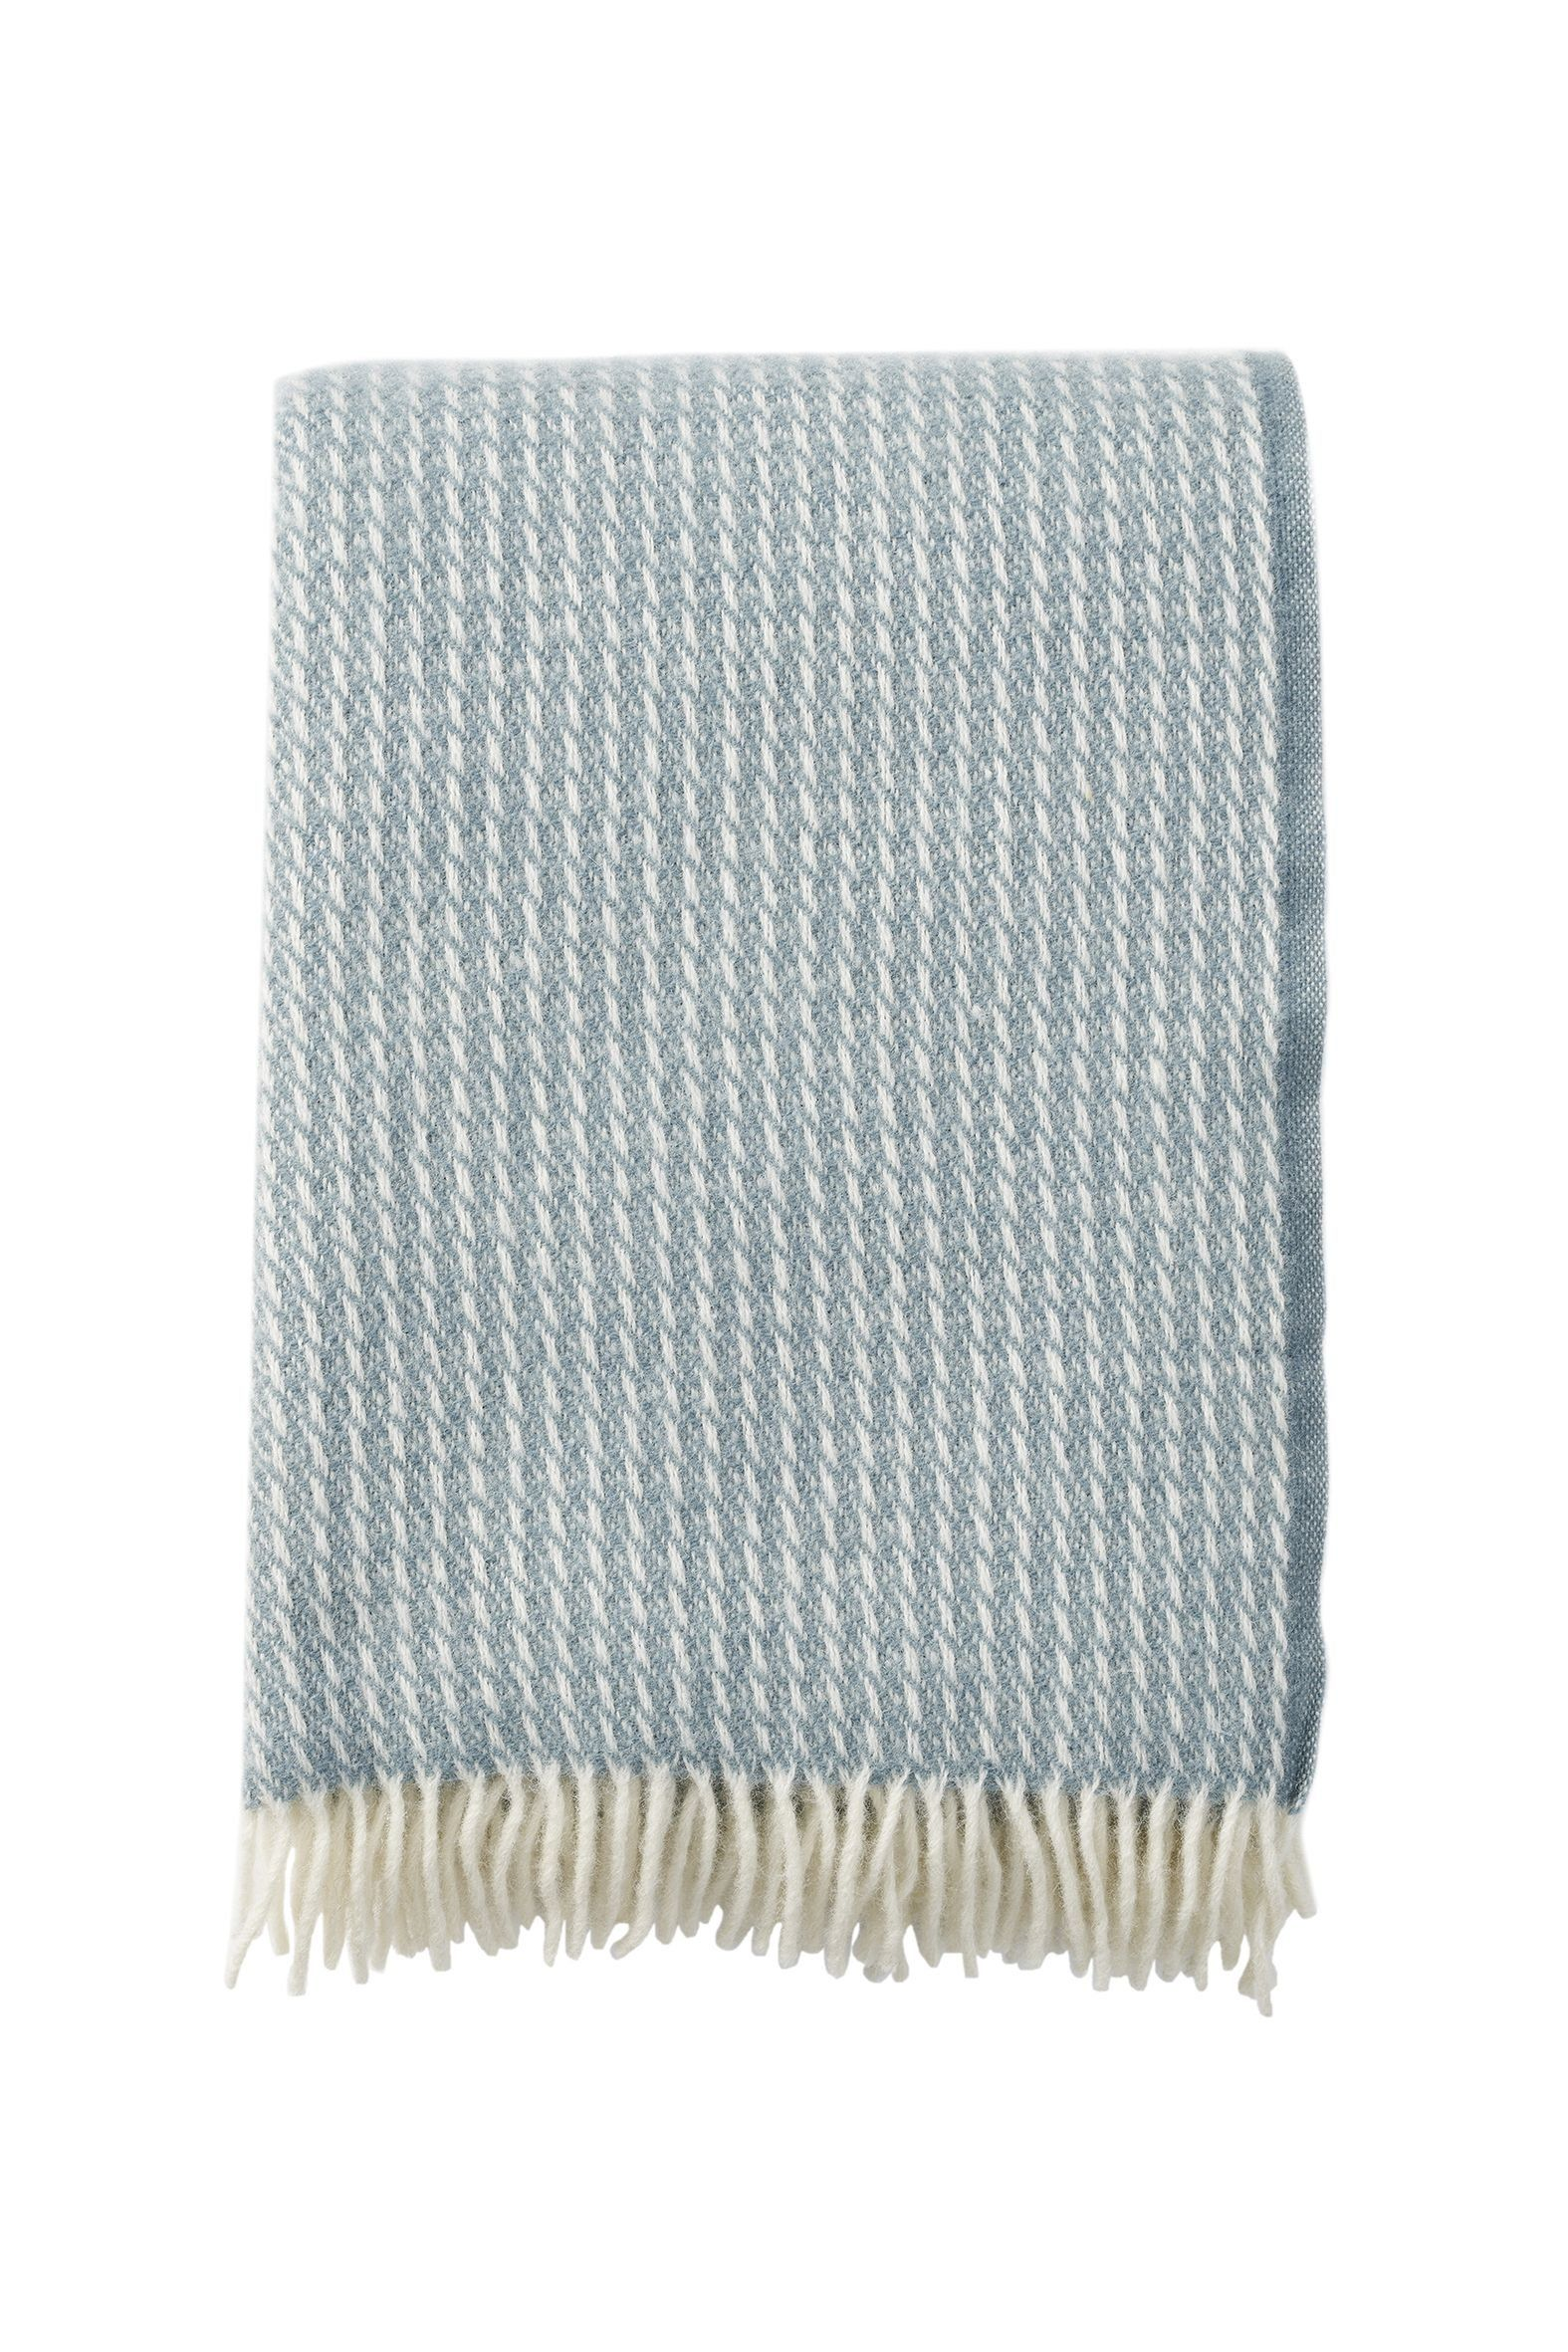 Klippan Line Dove Blue 100% Lambs Wool